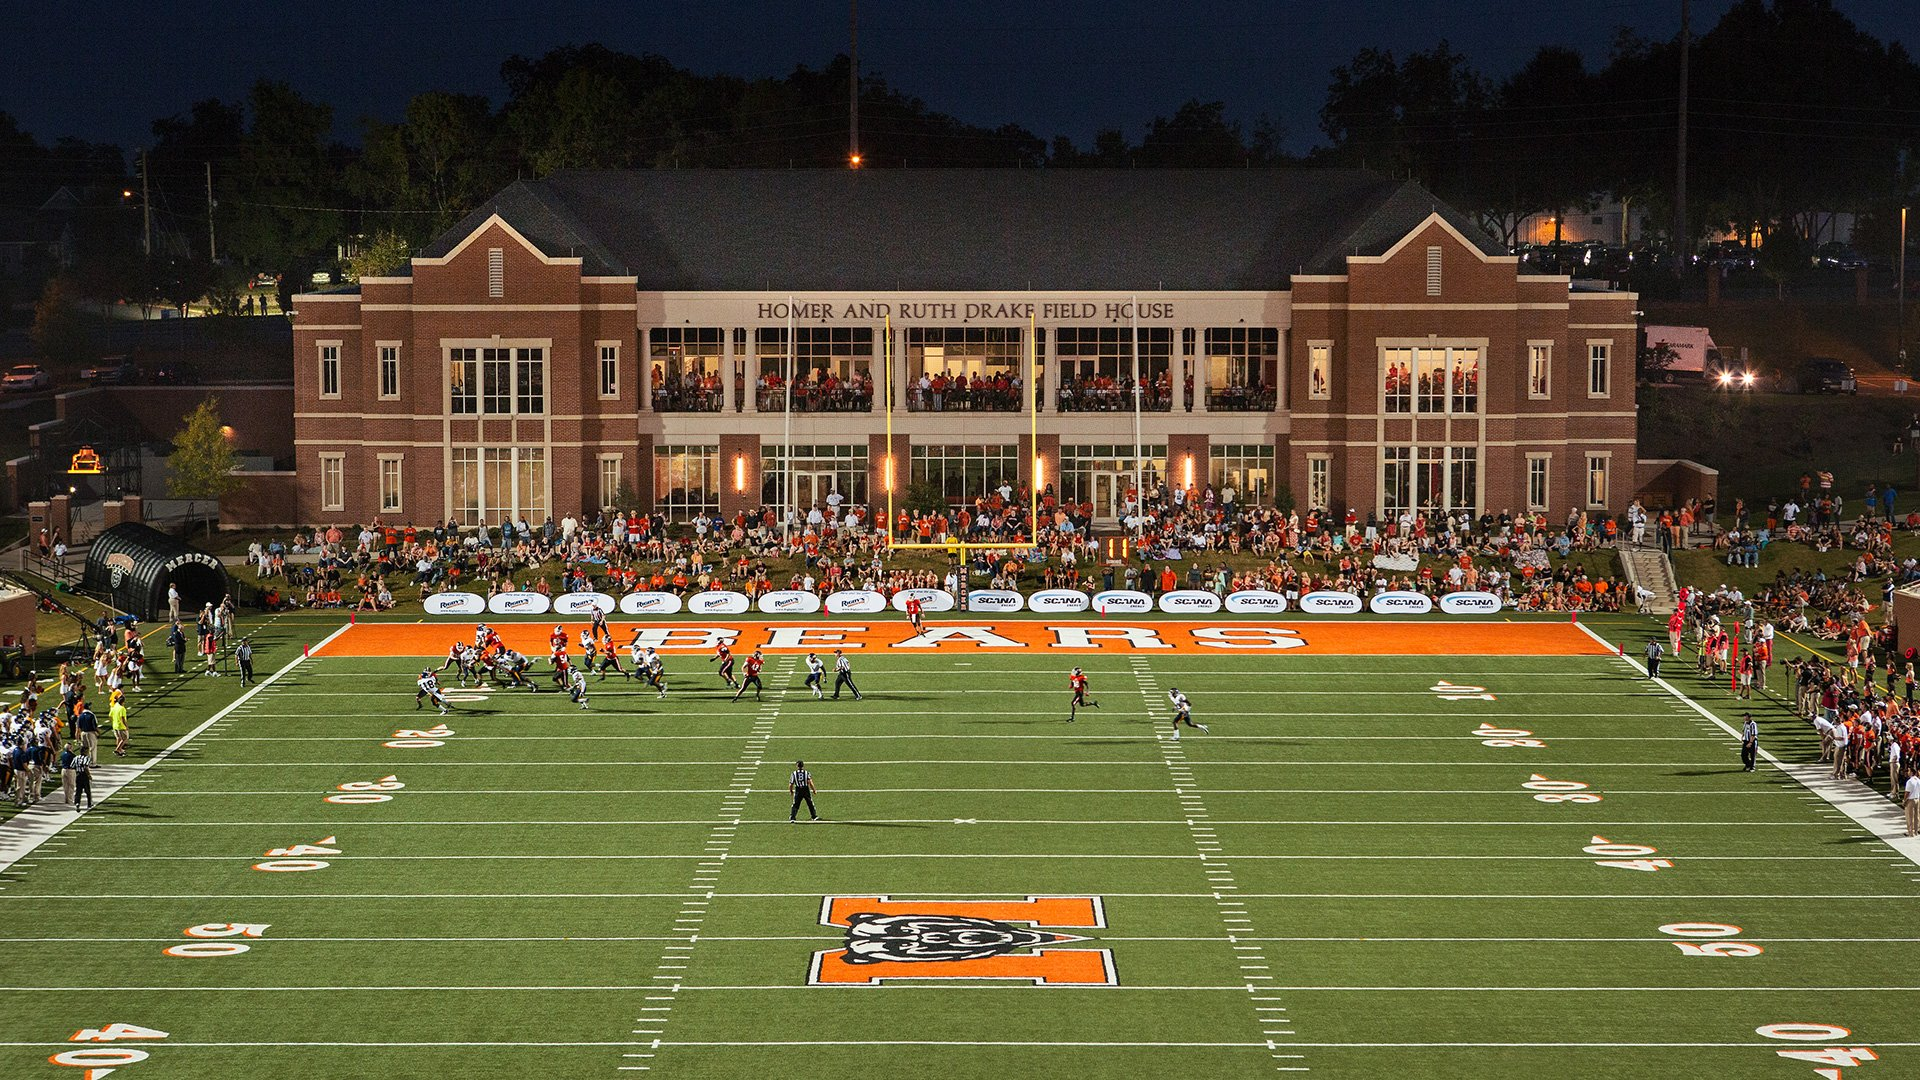 Mercer University, Football Stadium and Field House